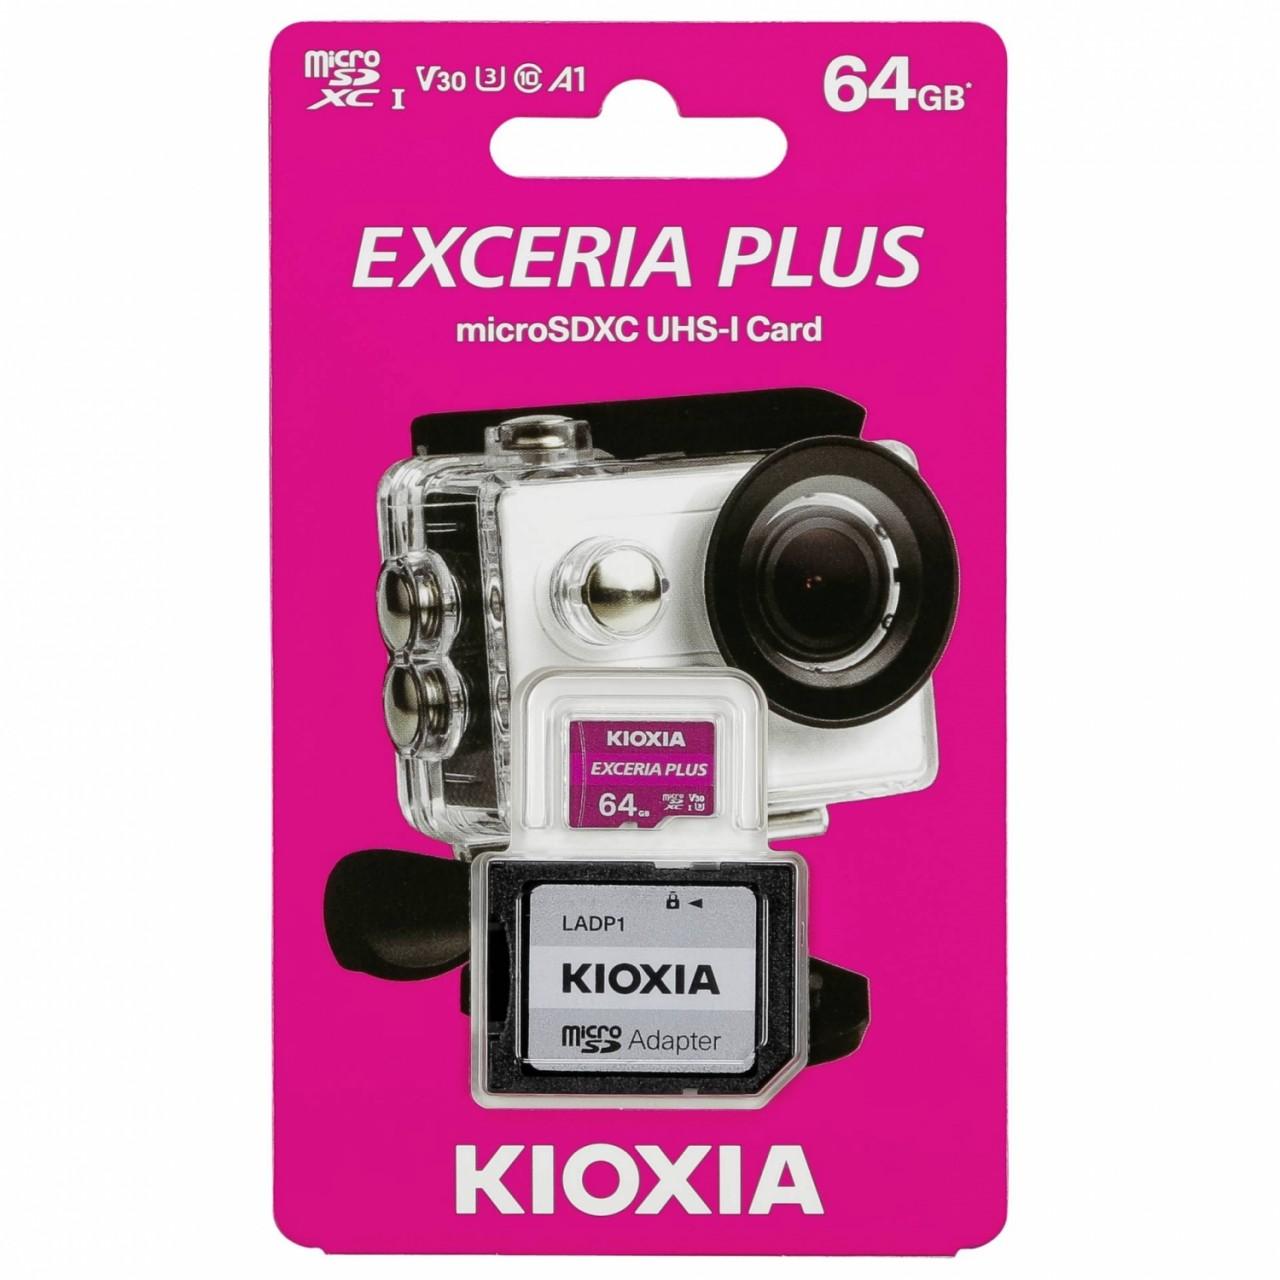 Kioxia Exceria Plus microSDXC 64GB Class 10 UHS-1 U3